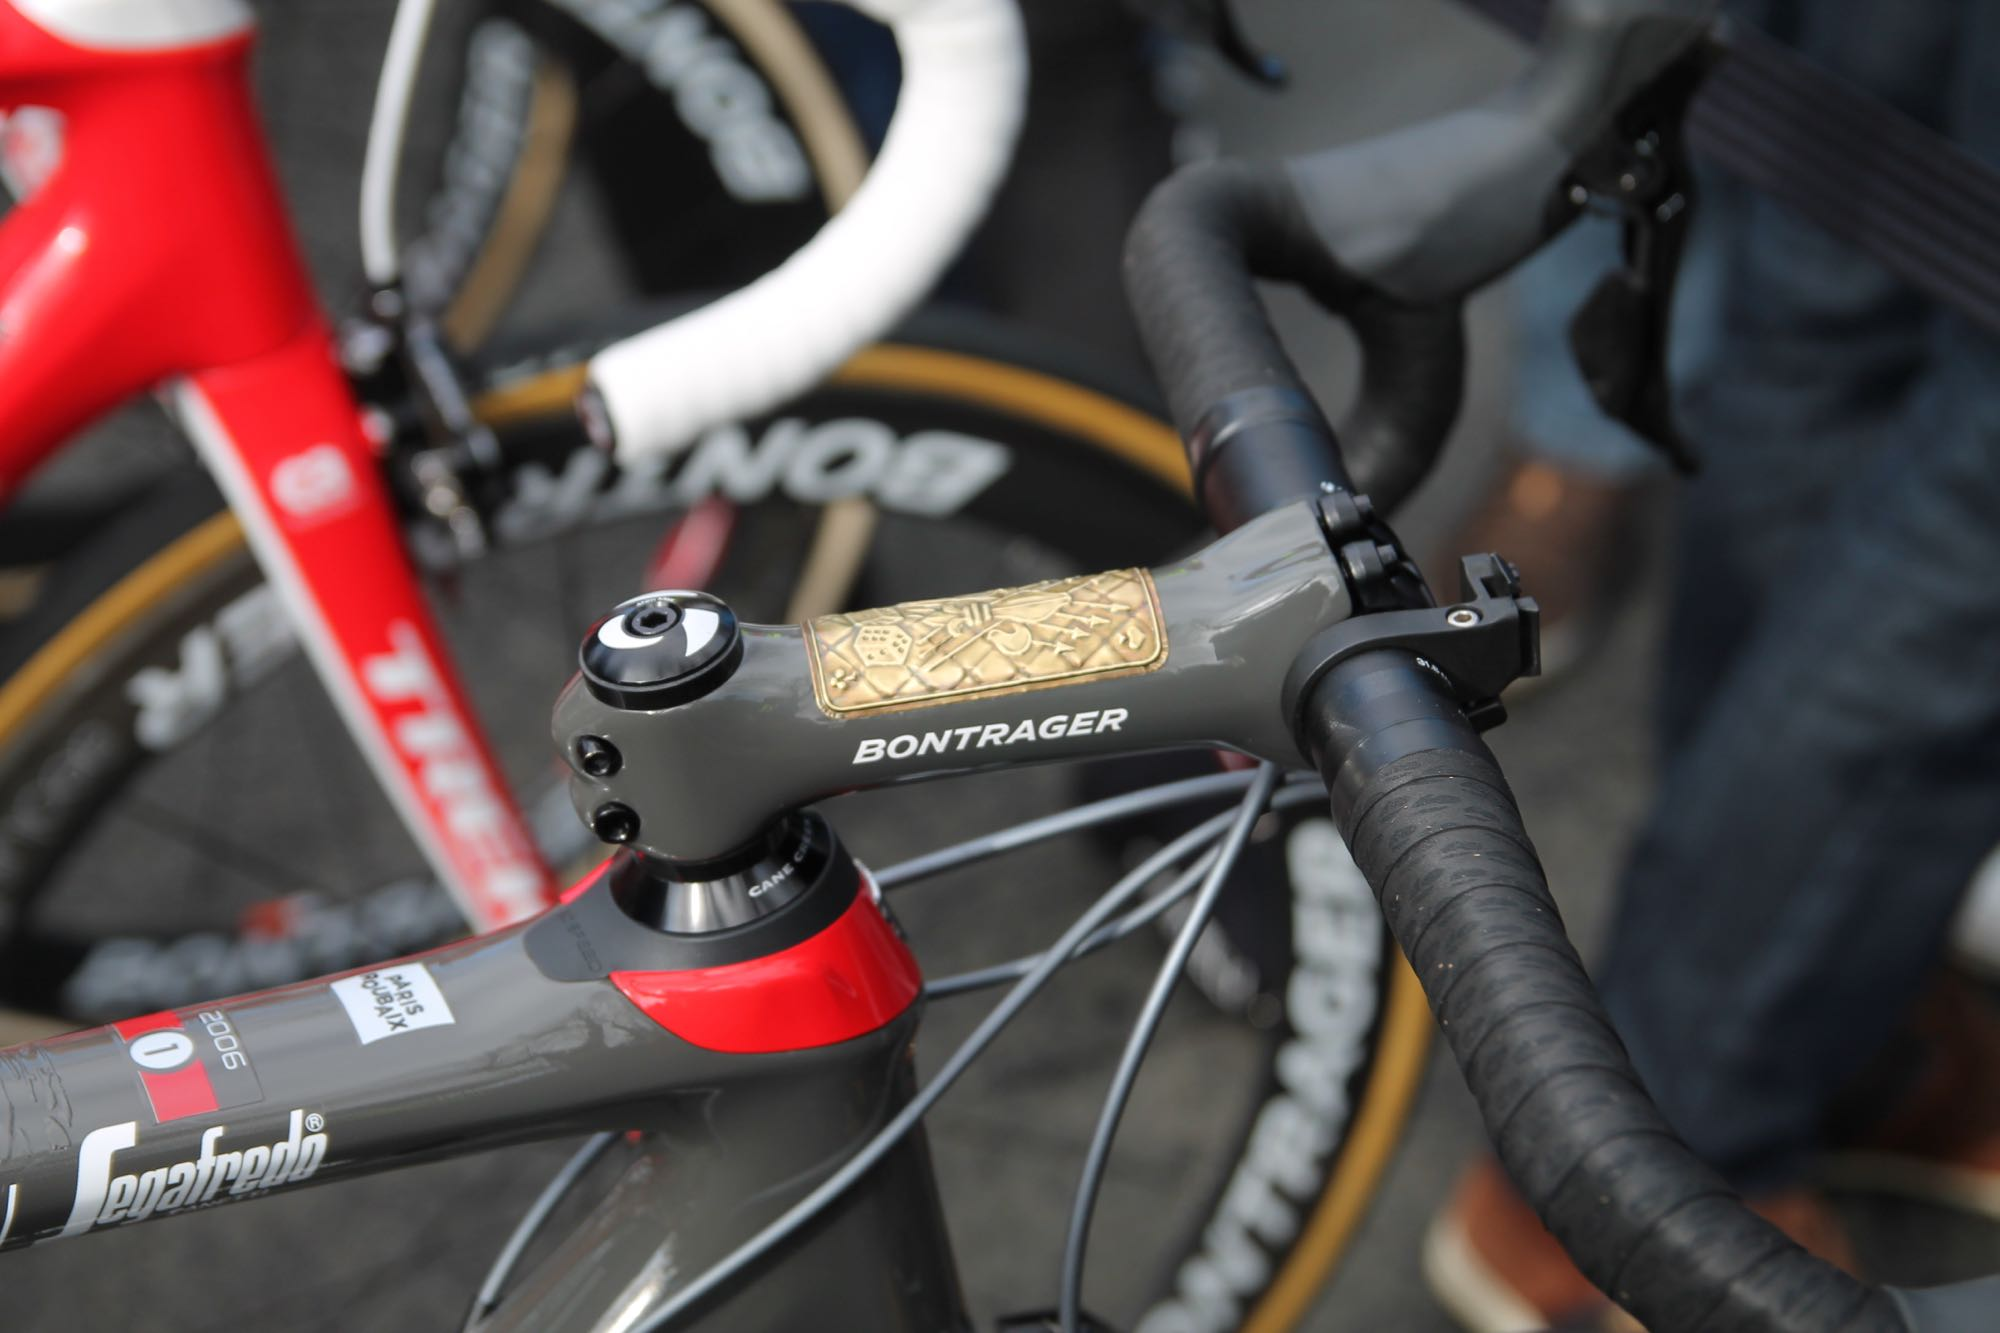 Paris-Roubaix Tech: Fabian Cancellara's Trek Domane SLR